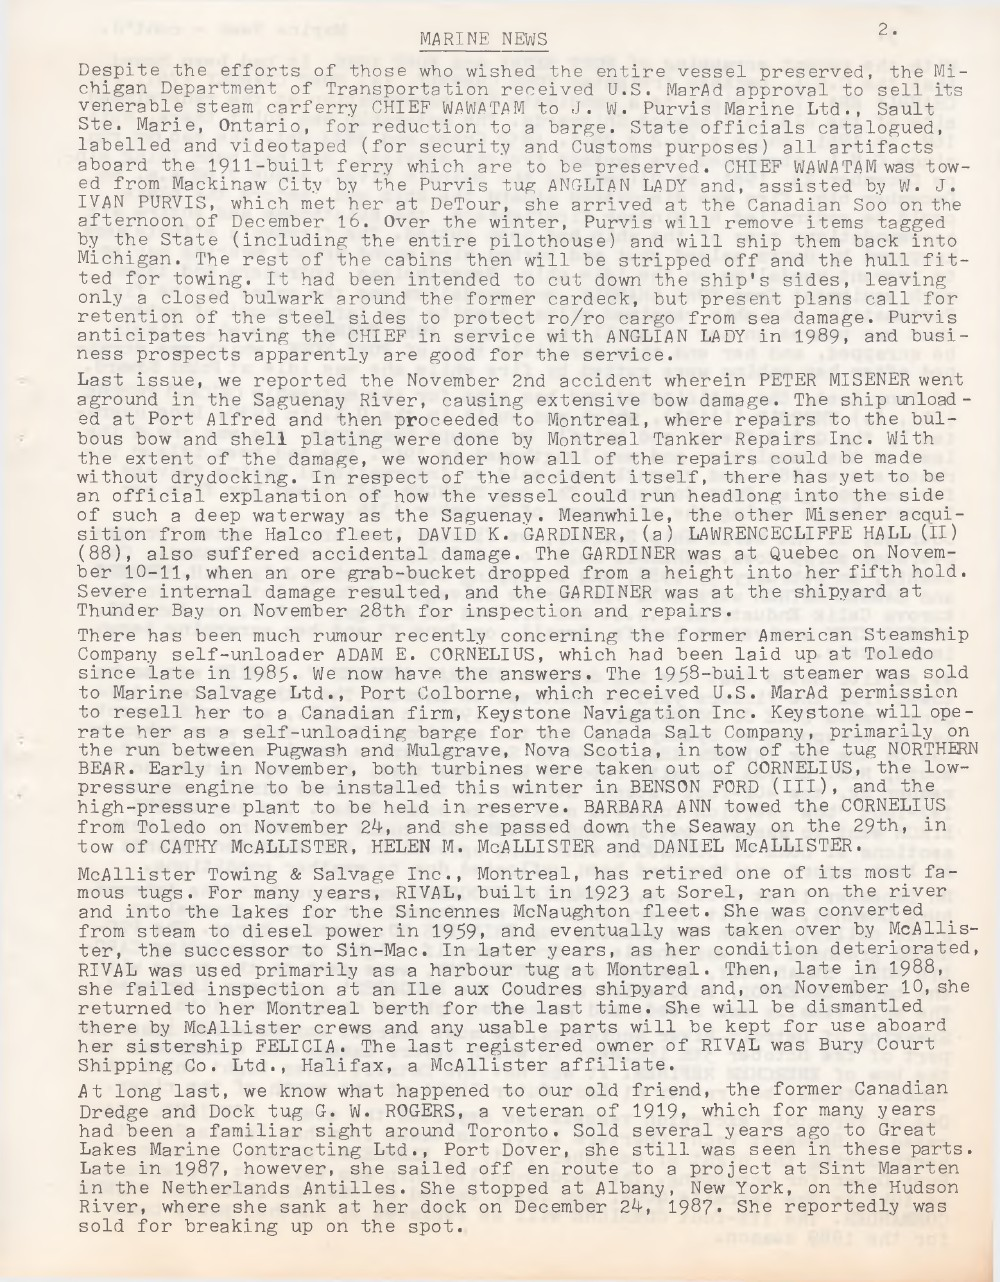 Scanner, v. 21, no. 4 (January 1989)